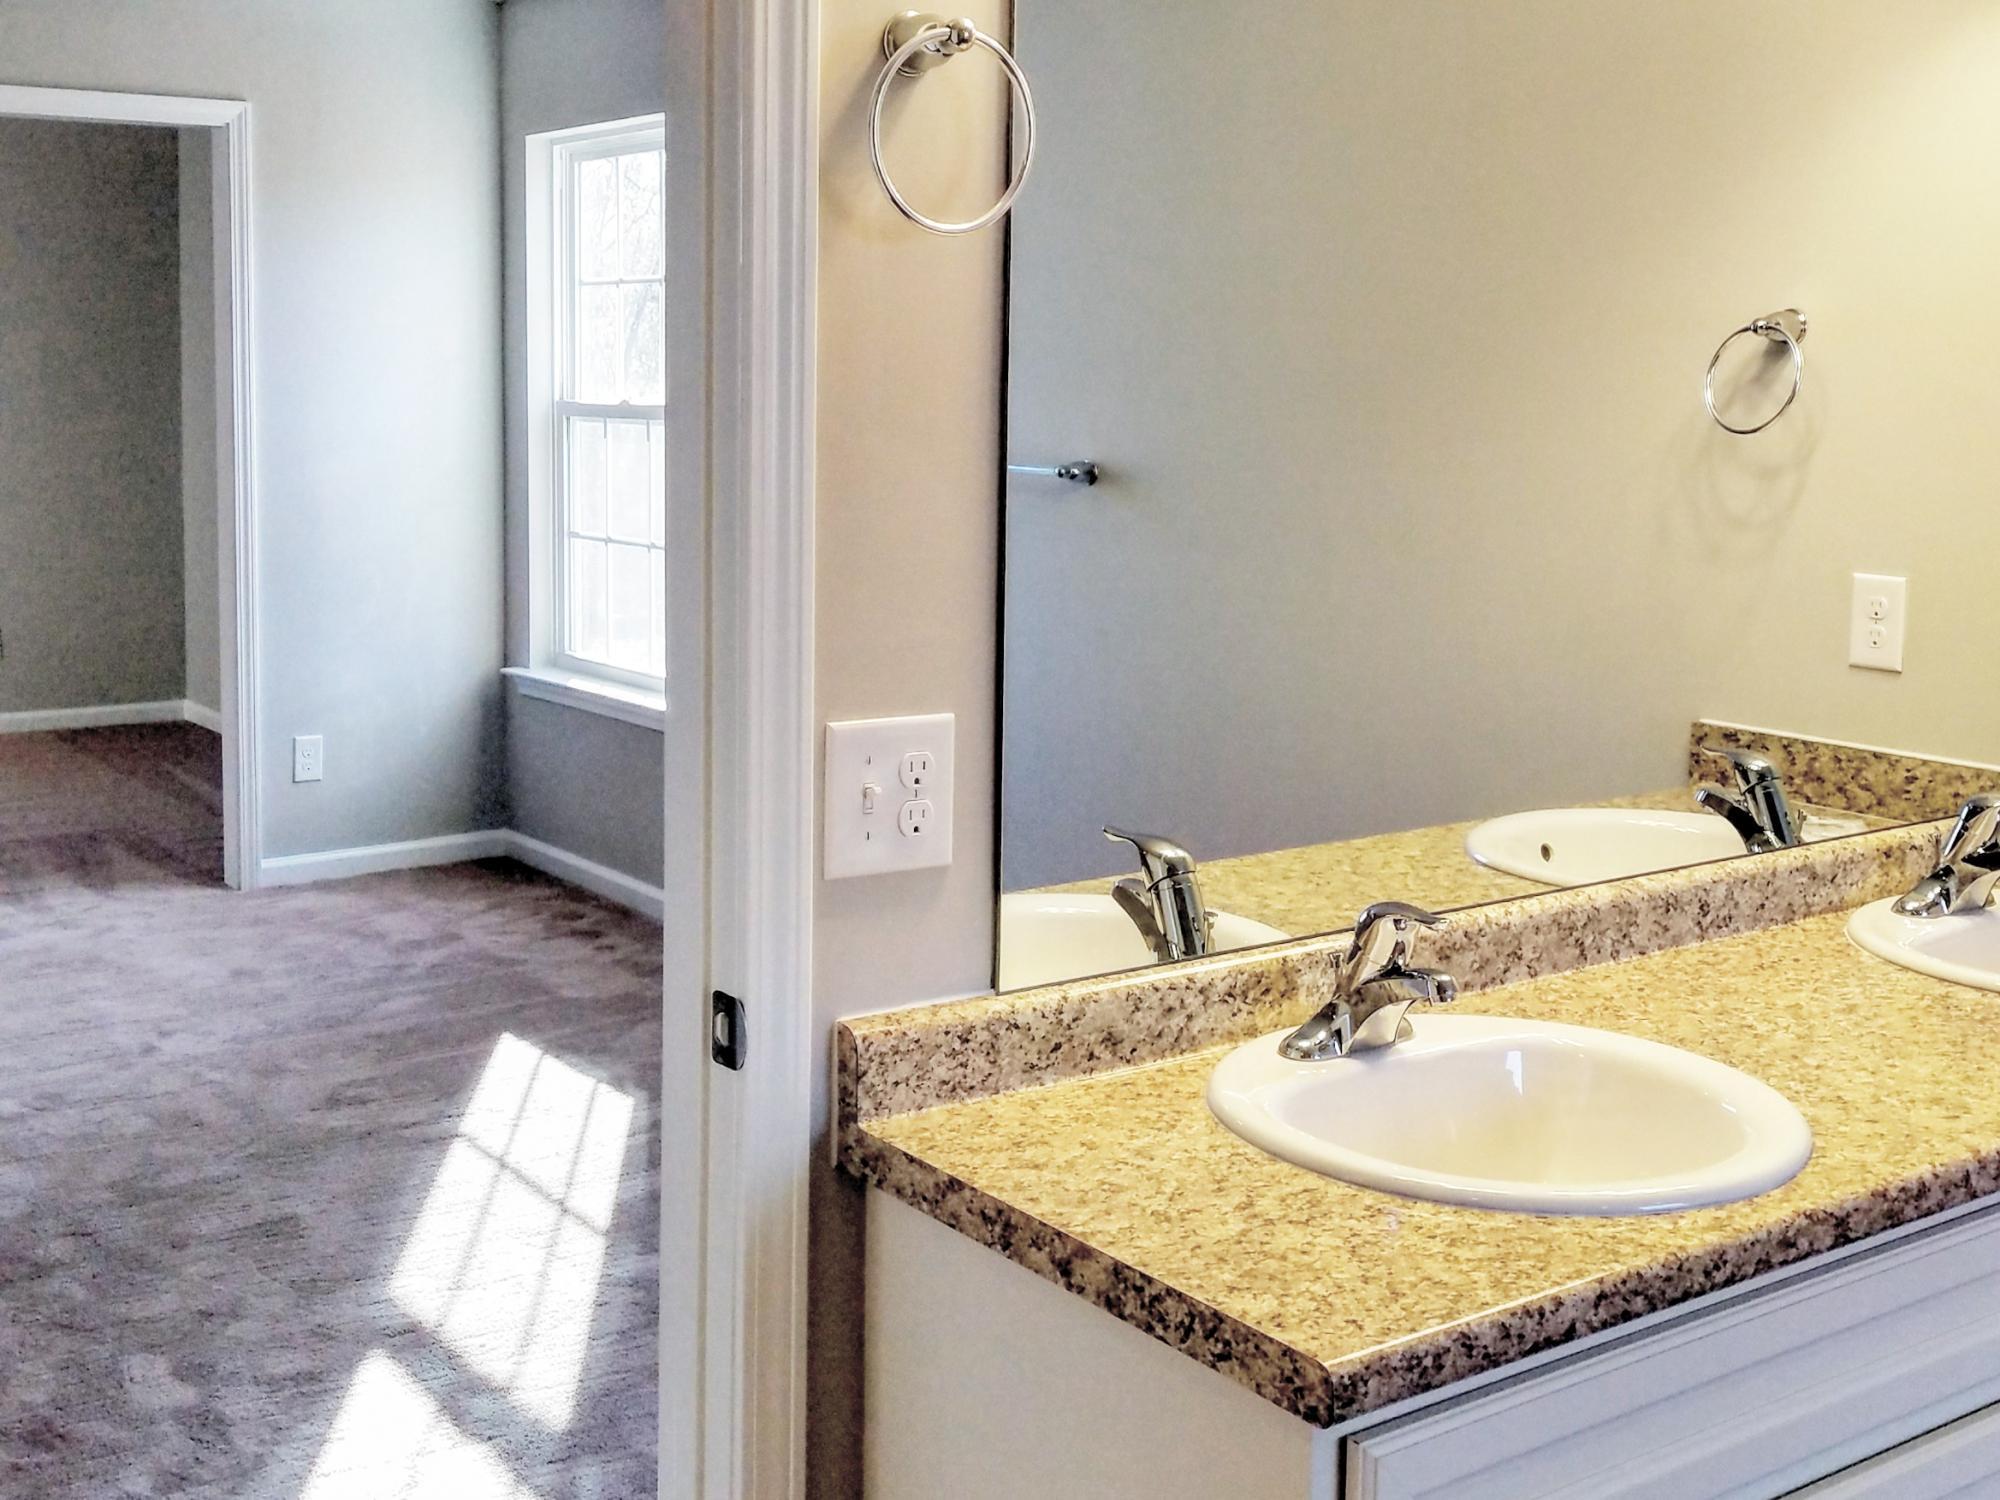 Bathroom featured in the Jasper By Konter Quality Homes in Savannah, GA